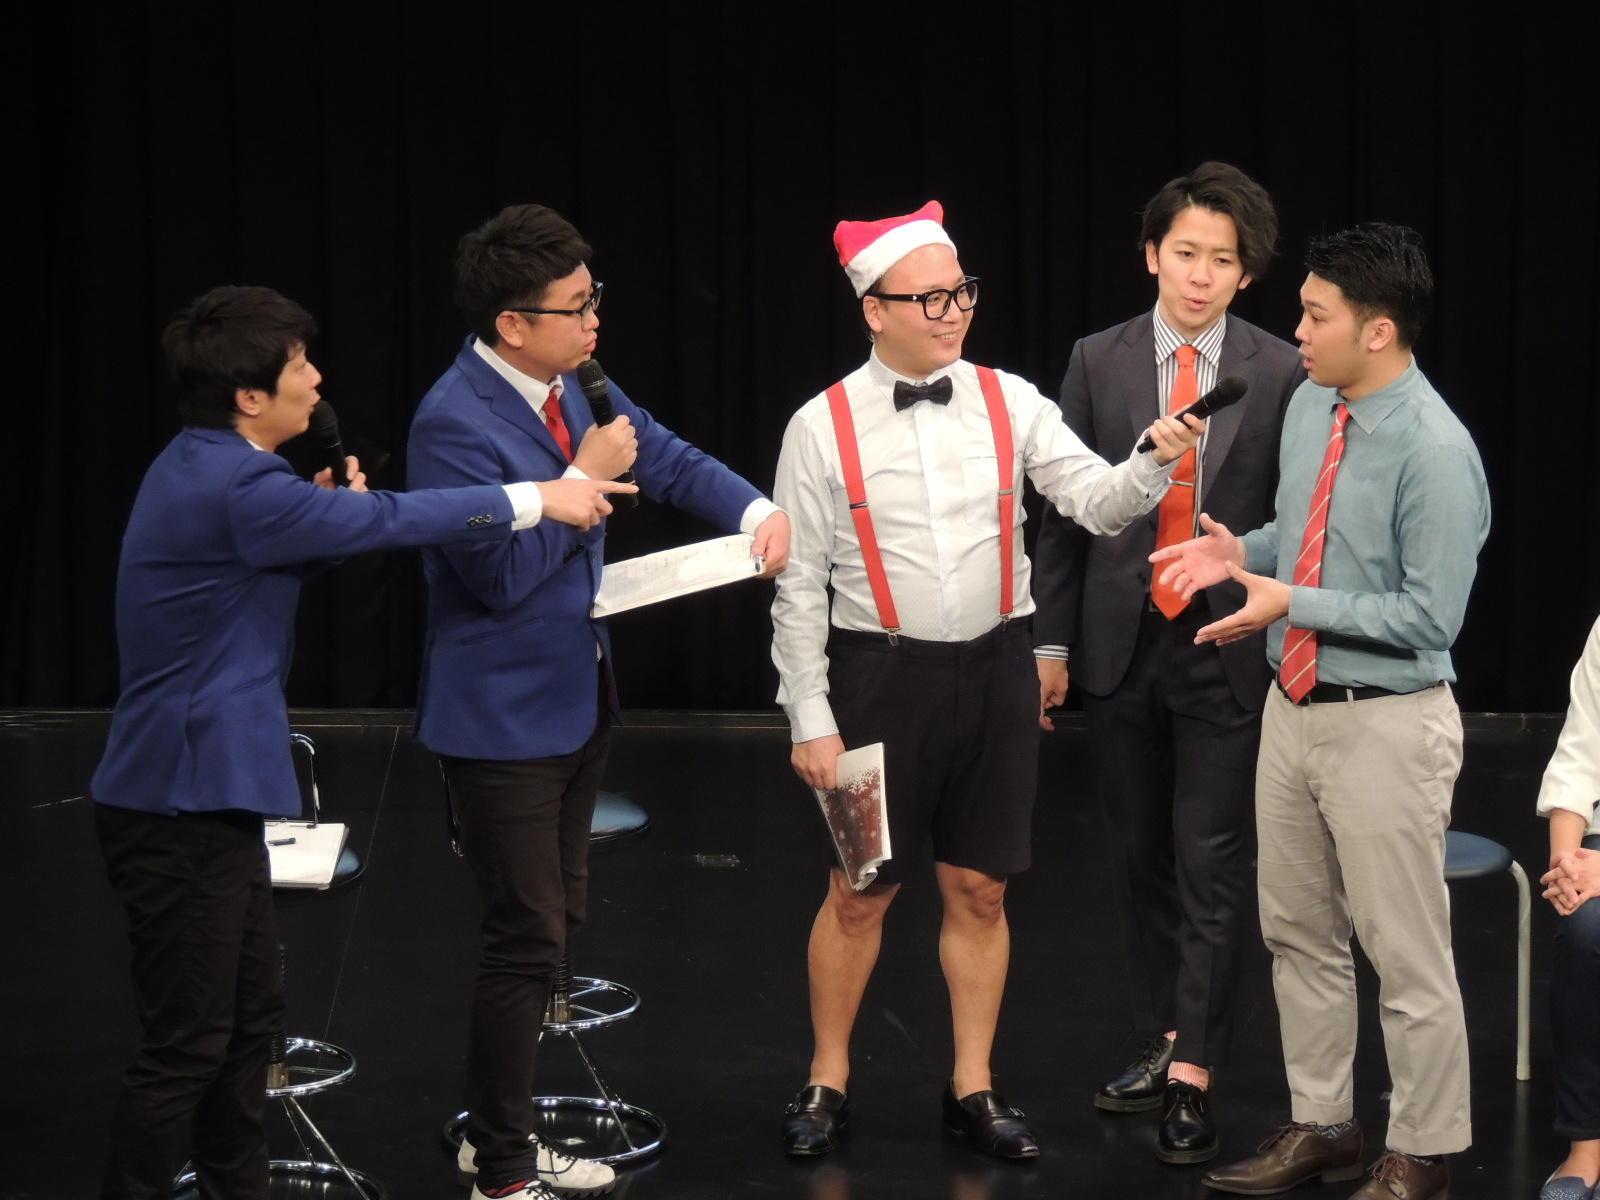 http://news.yoshimoto.co.jp/20190109211613-9fa3a9083d7267818aba6255eb5160fb70217282.jpg